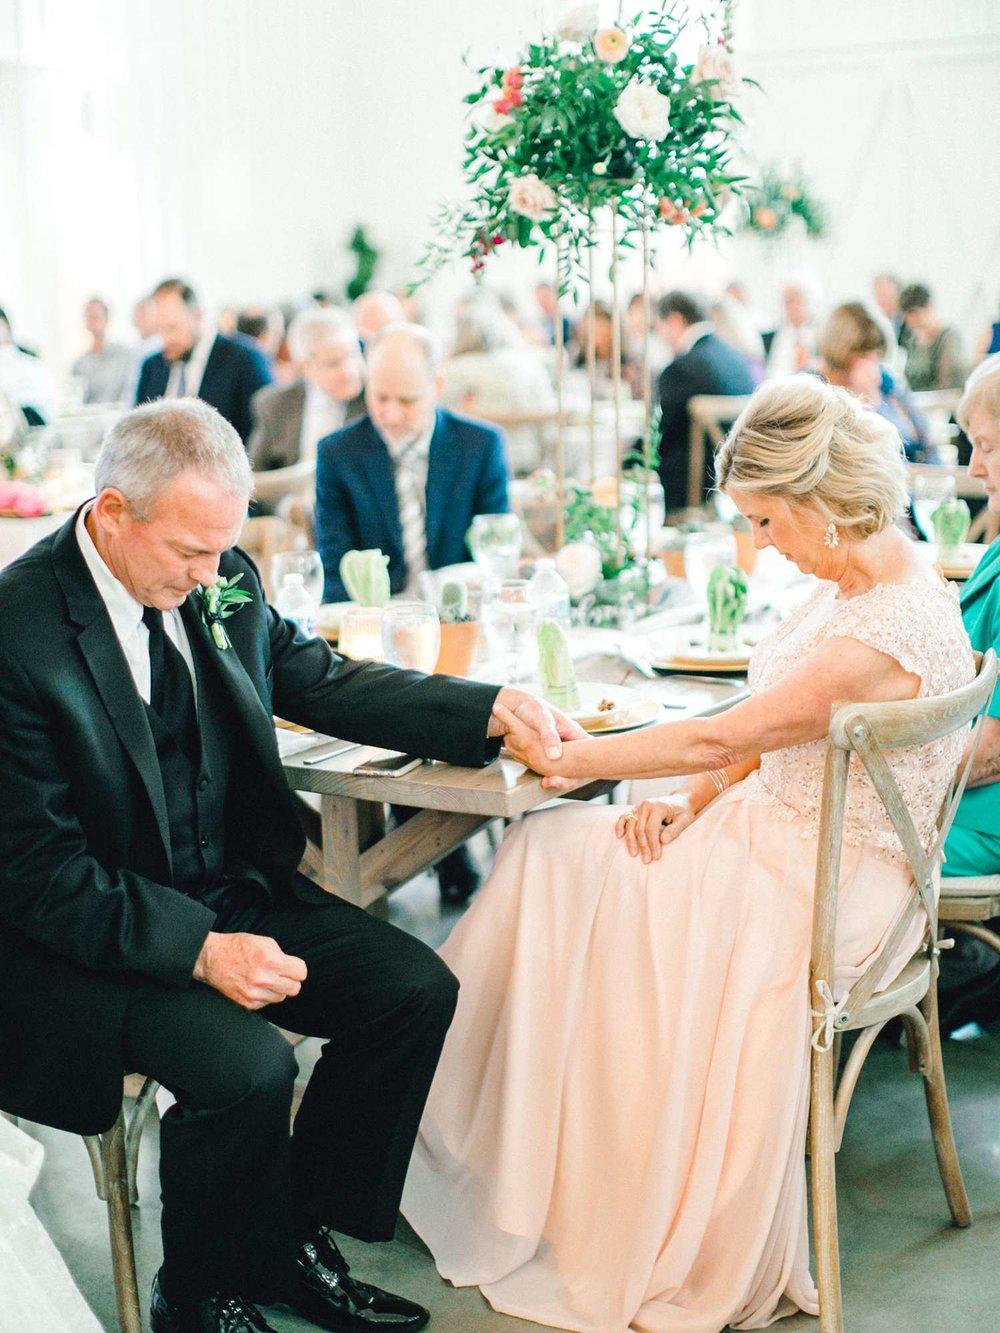 HEBERT_MORGAN_AND_CLAY_ALLEEJ_THE_FARMHOUSE_MONTGOMERY_TEXAS_WEDDING_0184.jpg